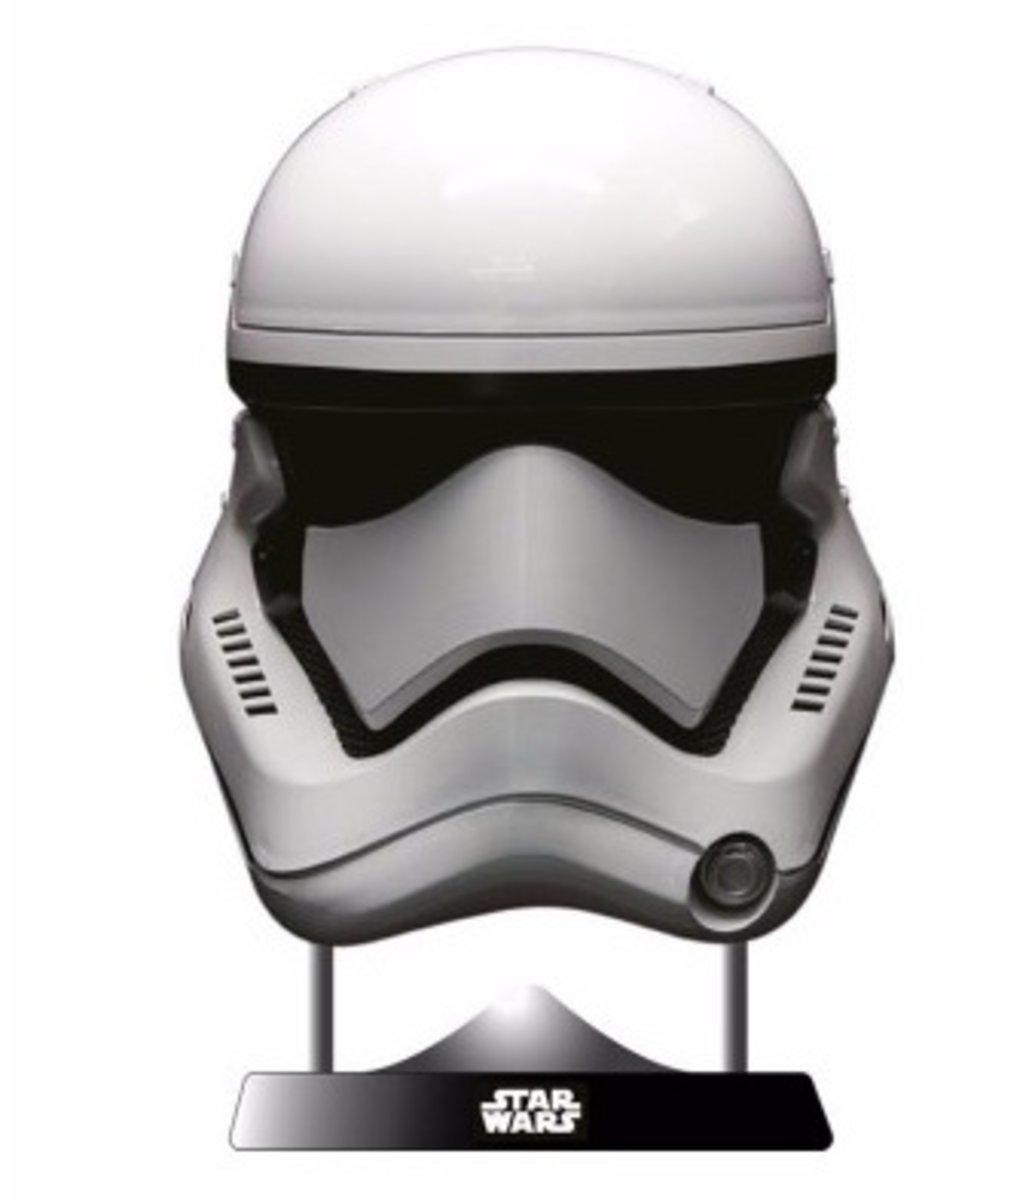 Star Wars Stormtrooper 帝國風暴兵無線藍芽喇叭 761567 香港行貨